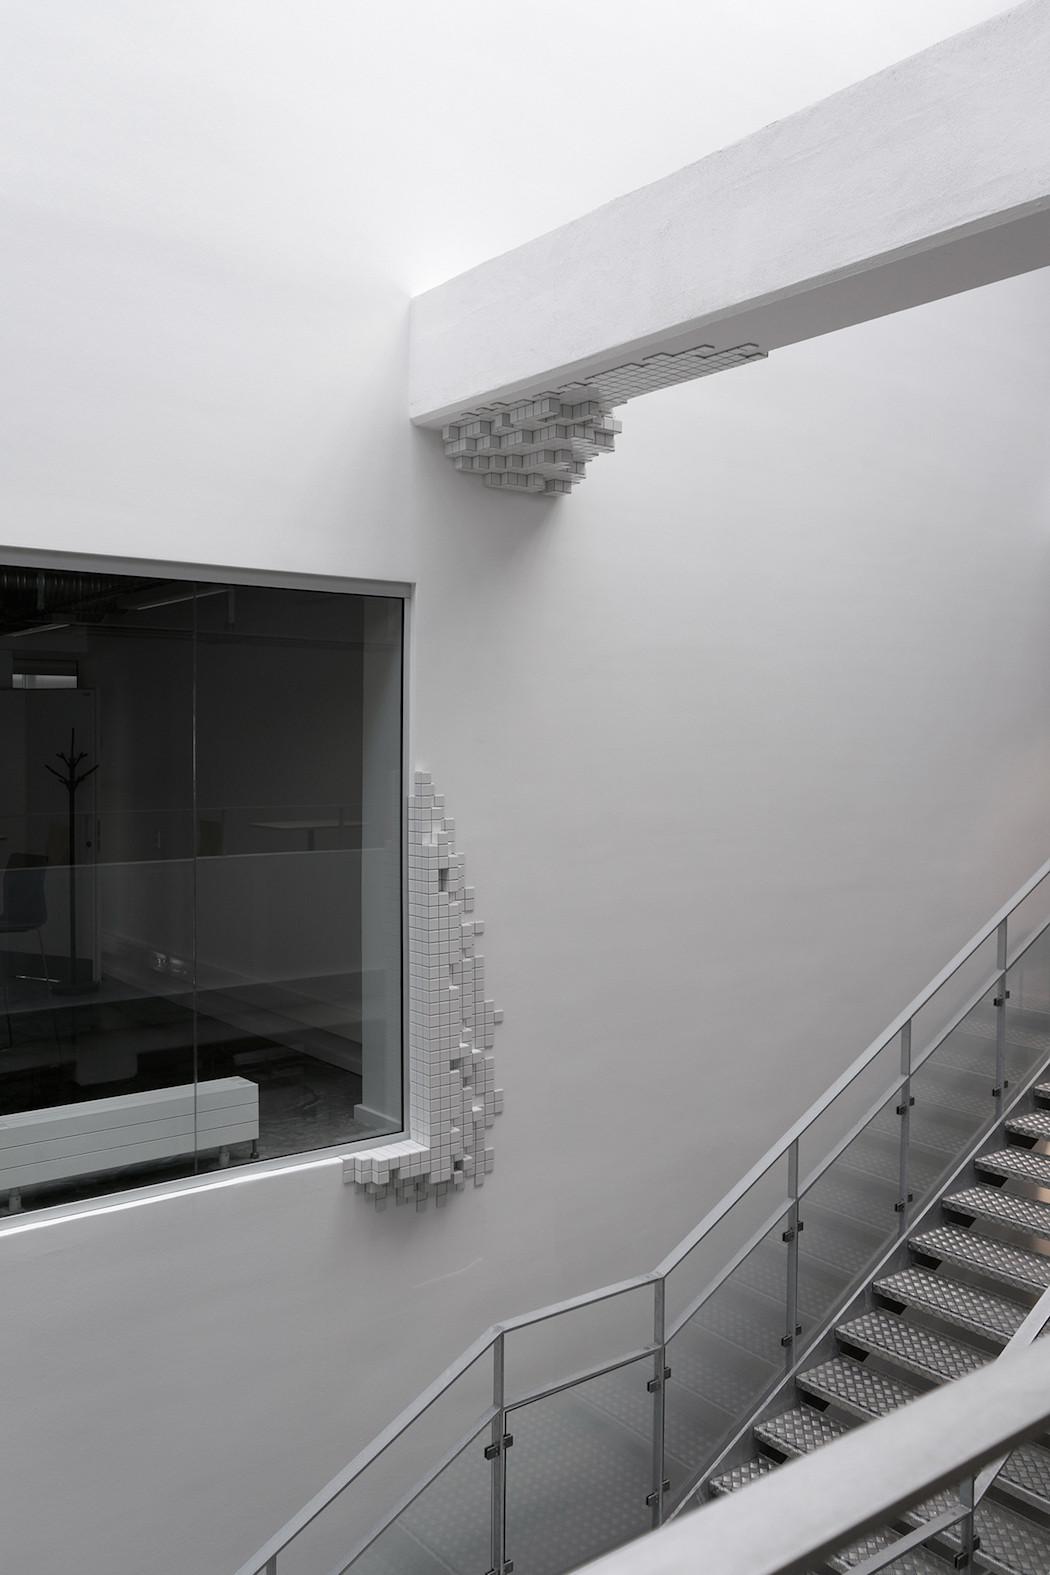 art_borgmannlenk_mos_installation_08-1050x1575